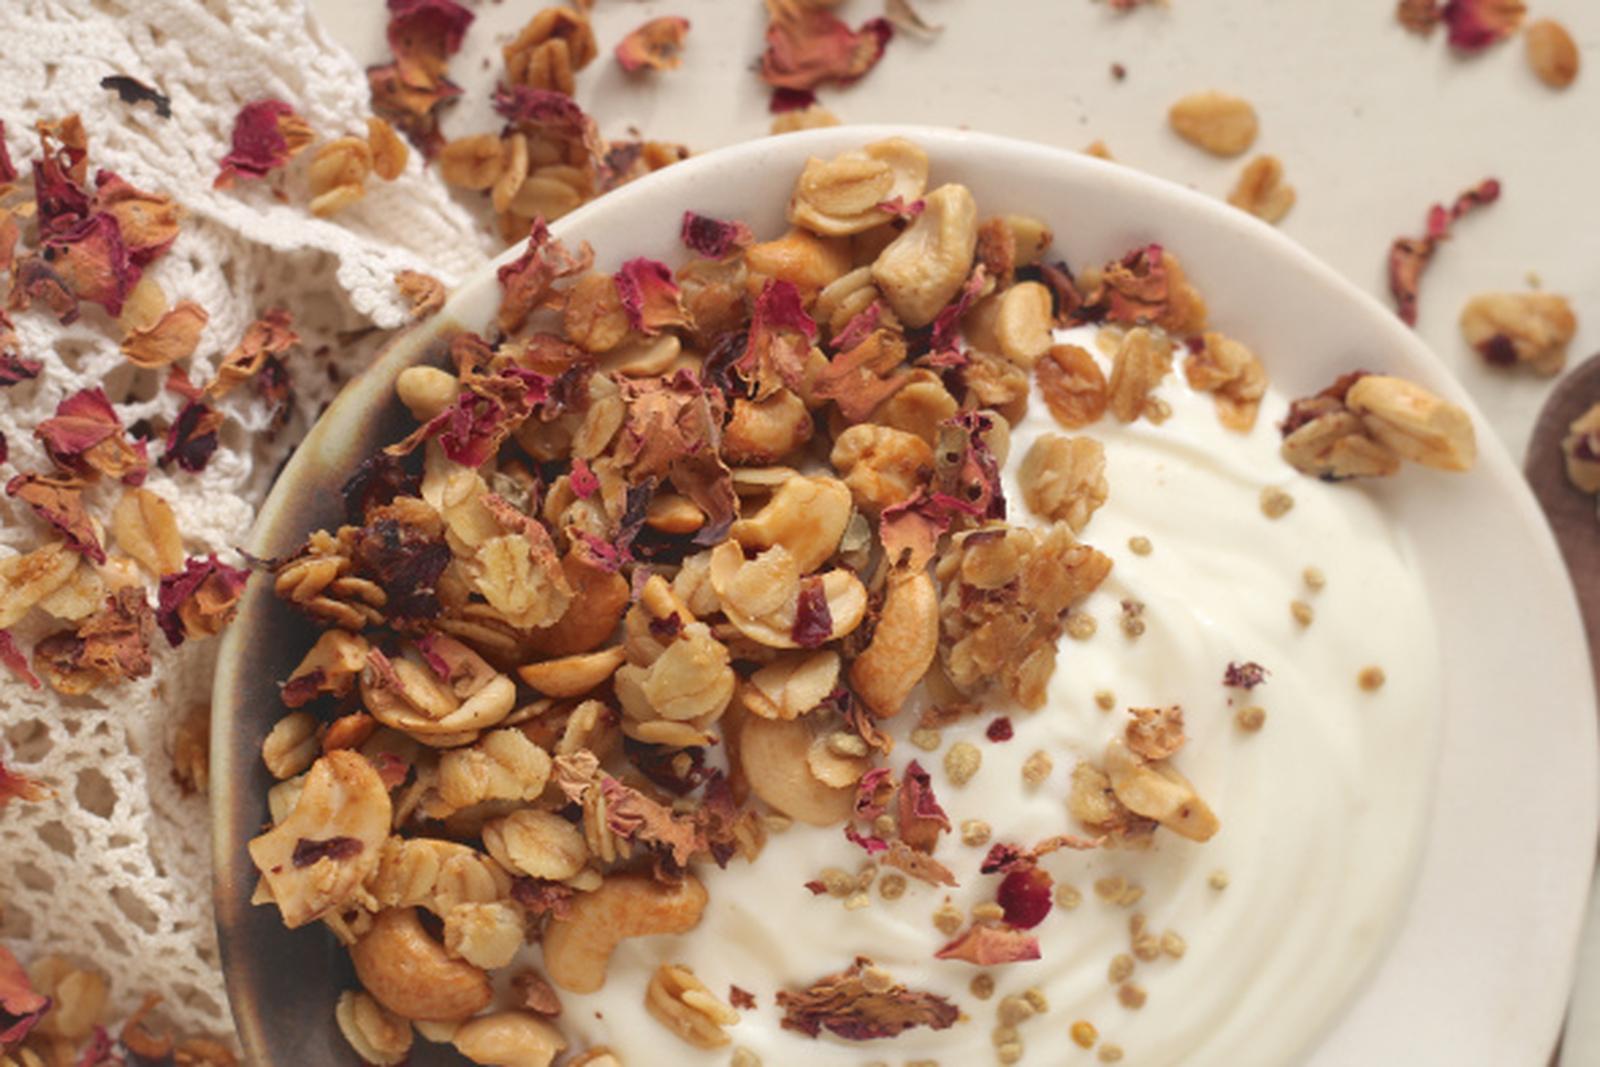 Rose Petal, Cashew, and Olive Oil Granola [Vegan]